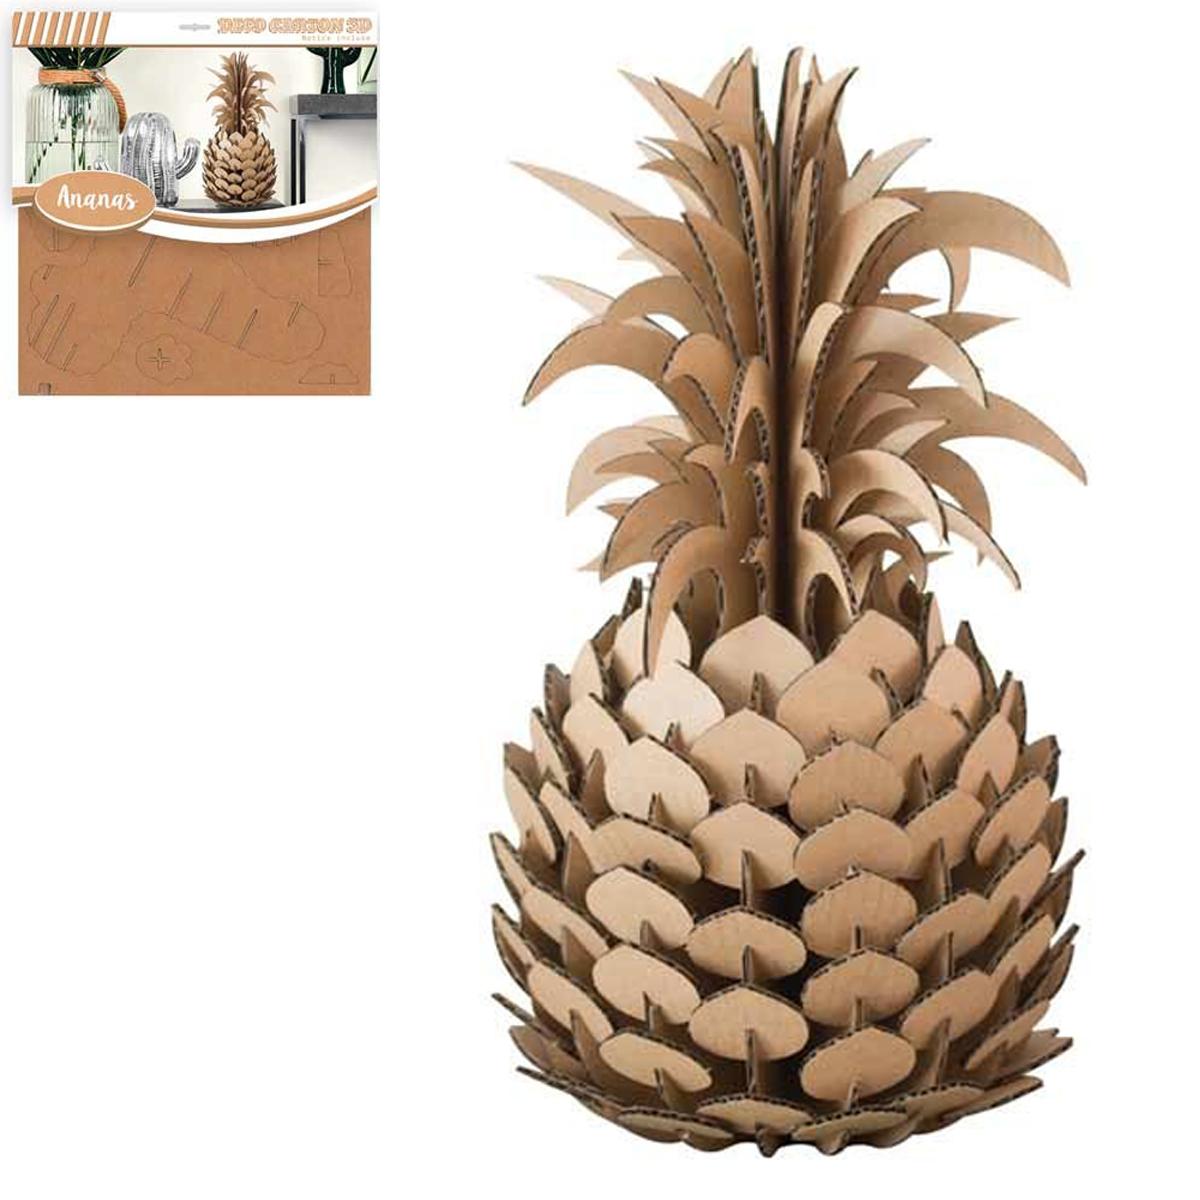 Figurine carton 3D \'Ananas\' - planches 30x305 cm - [Q3143]